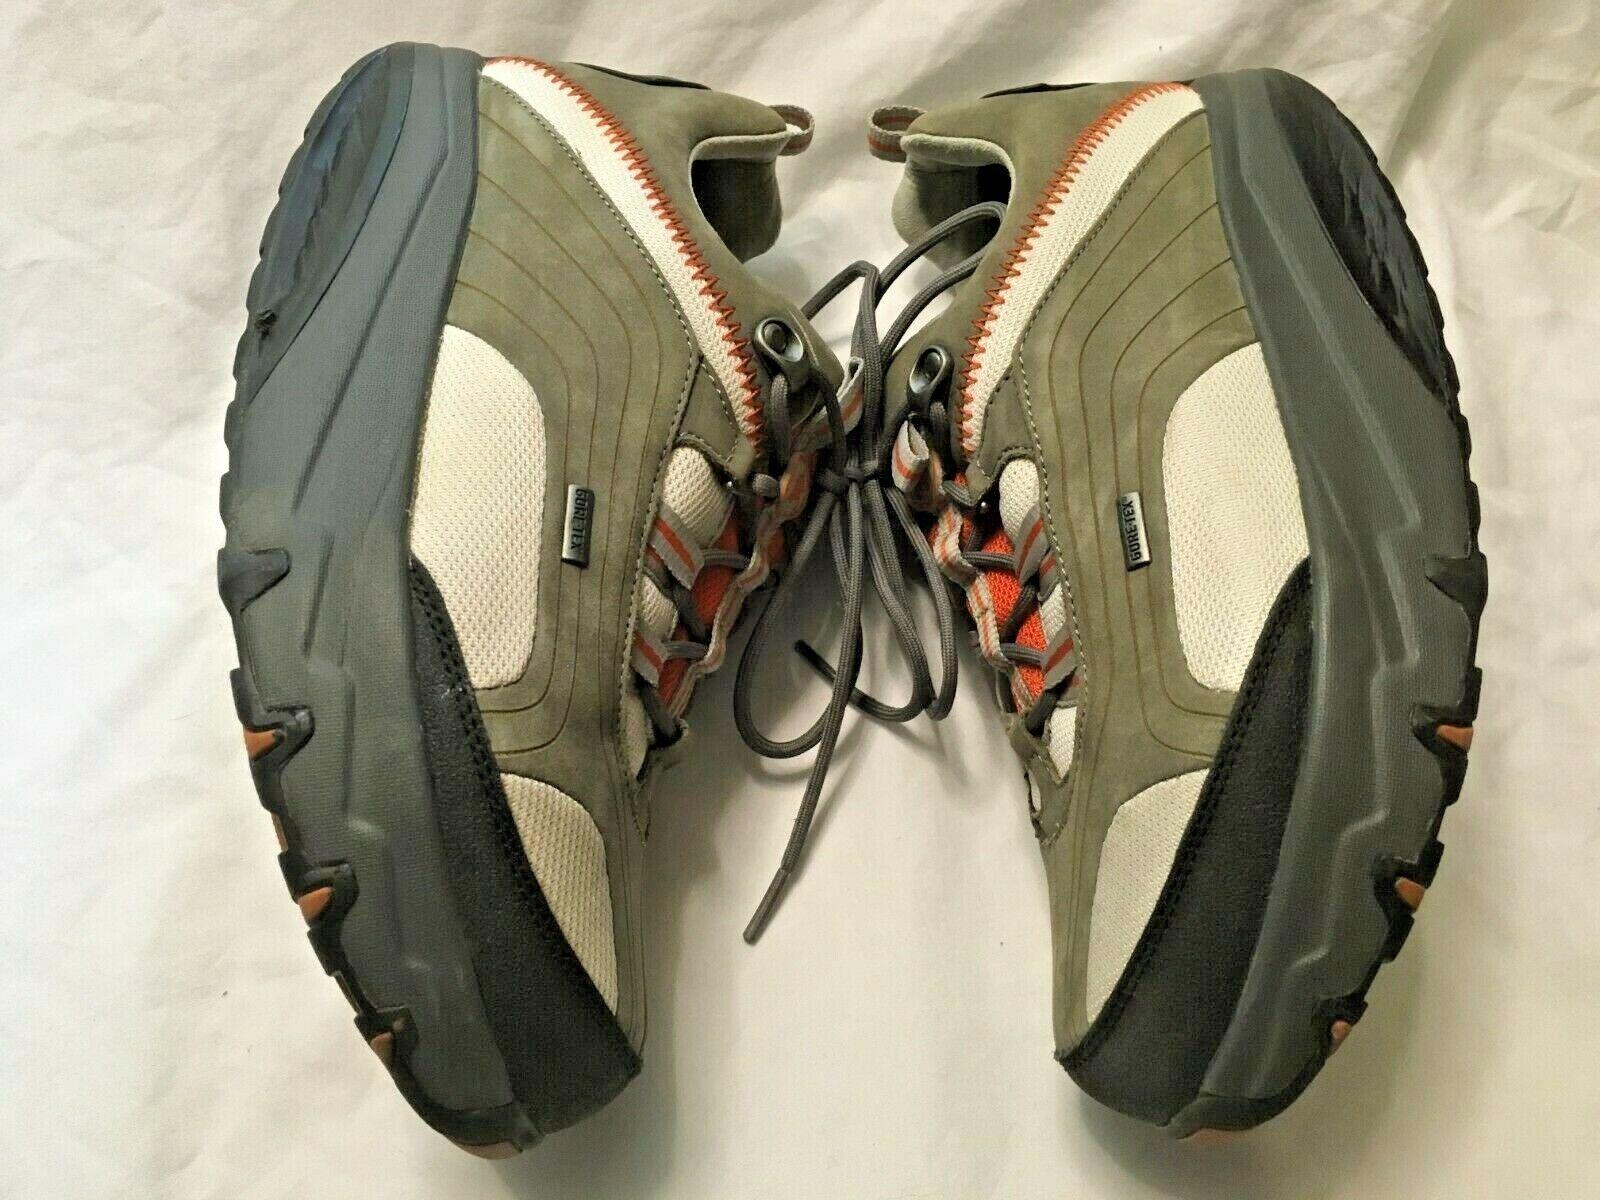 MBT Chapa Pumpkin Athletic zapatos (Gore-Tex Waterproof, High Rocker Sole) Talla 8